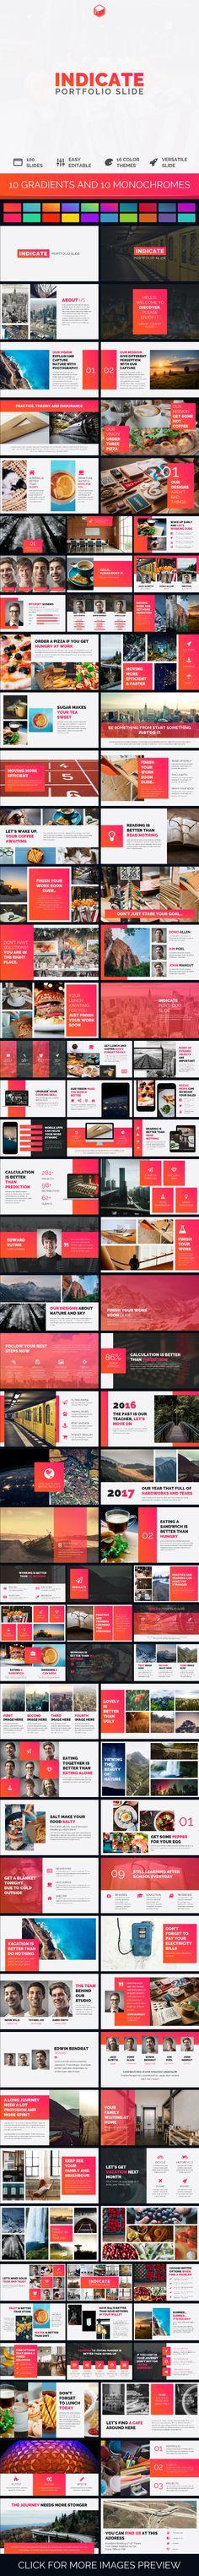 Indicate - Portfolio Slide - #PowerPoint Templates #Presentation #Templates Download here: https://graphicriver.net/item/indicate-portfolio-slide/19514507?ref=alena994